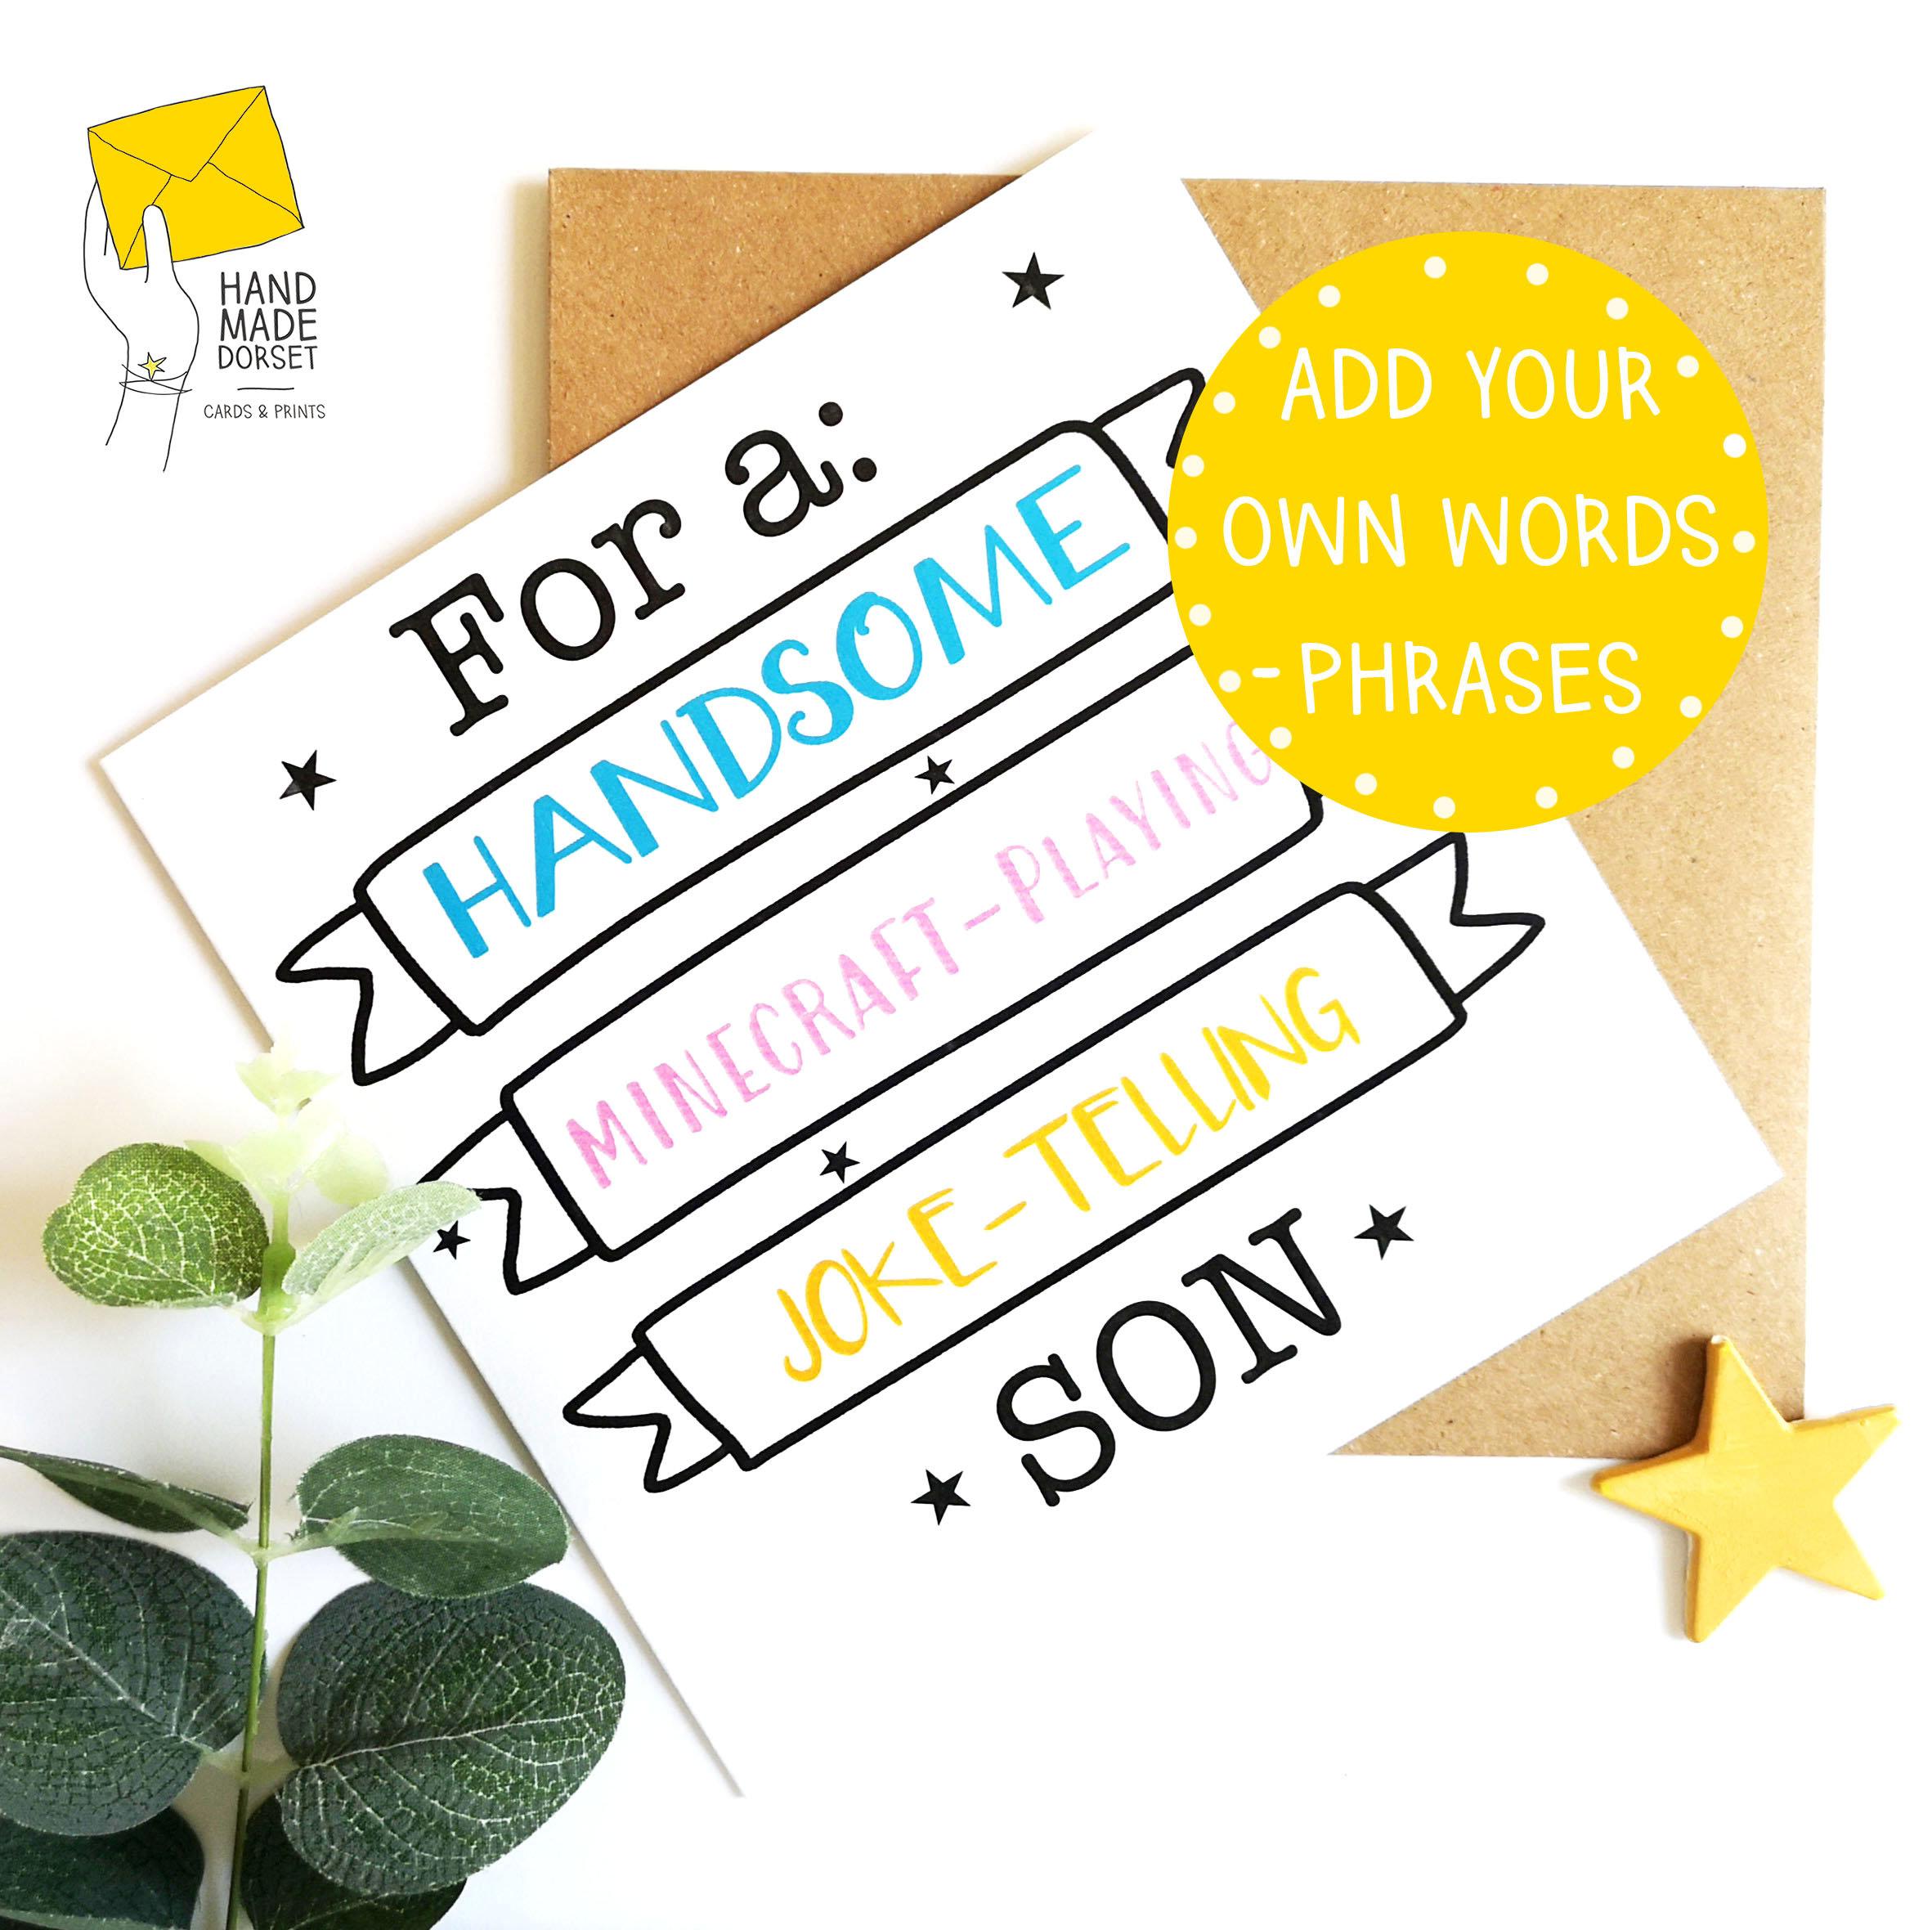 Strange Funny Son Birthday Card Bespoke Son Card Handmade Dorset Funny Birthday Cards Online Alyptdamsfinfo